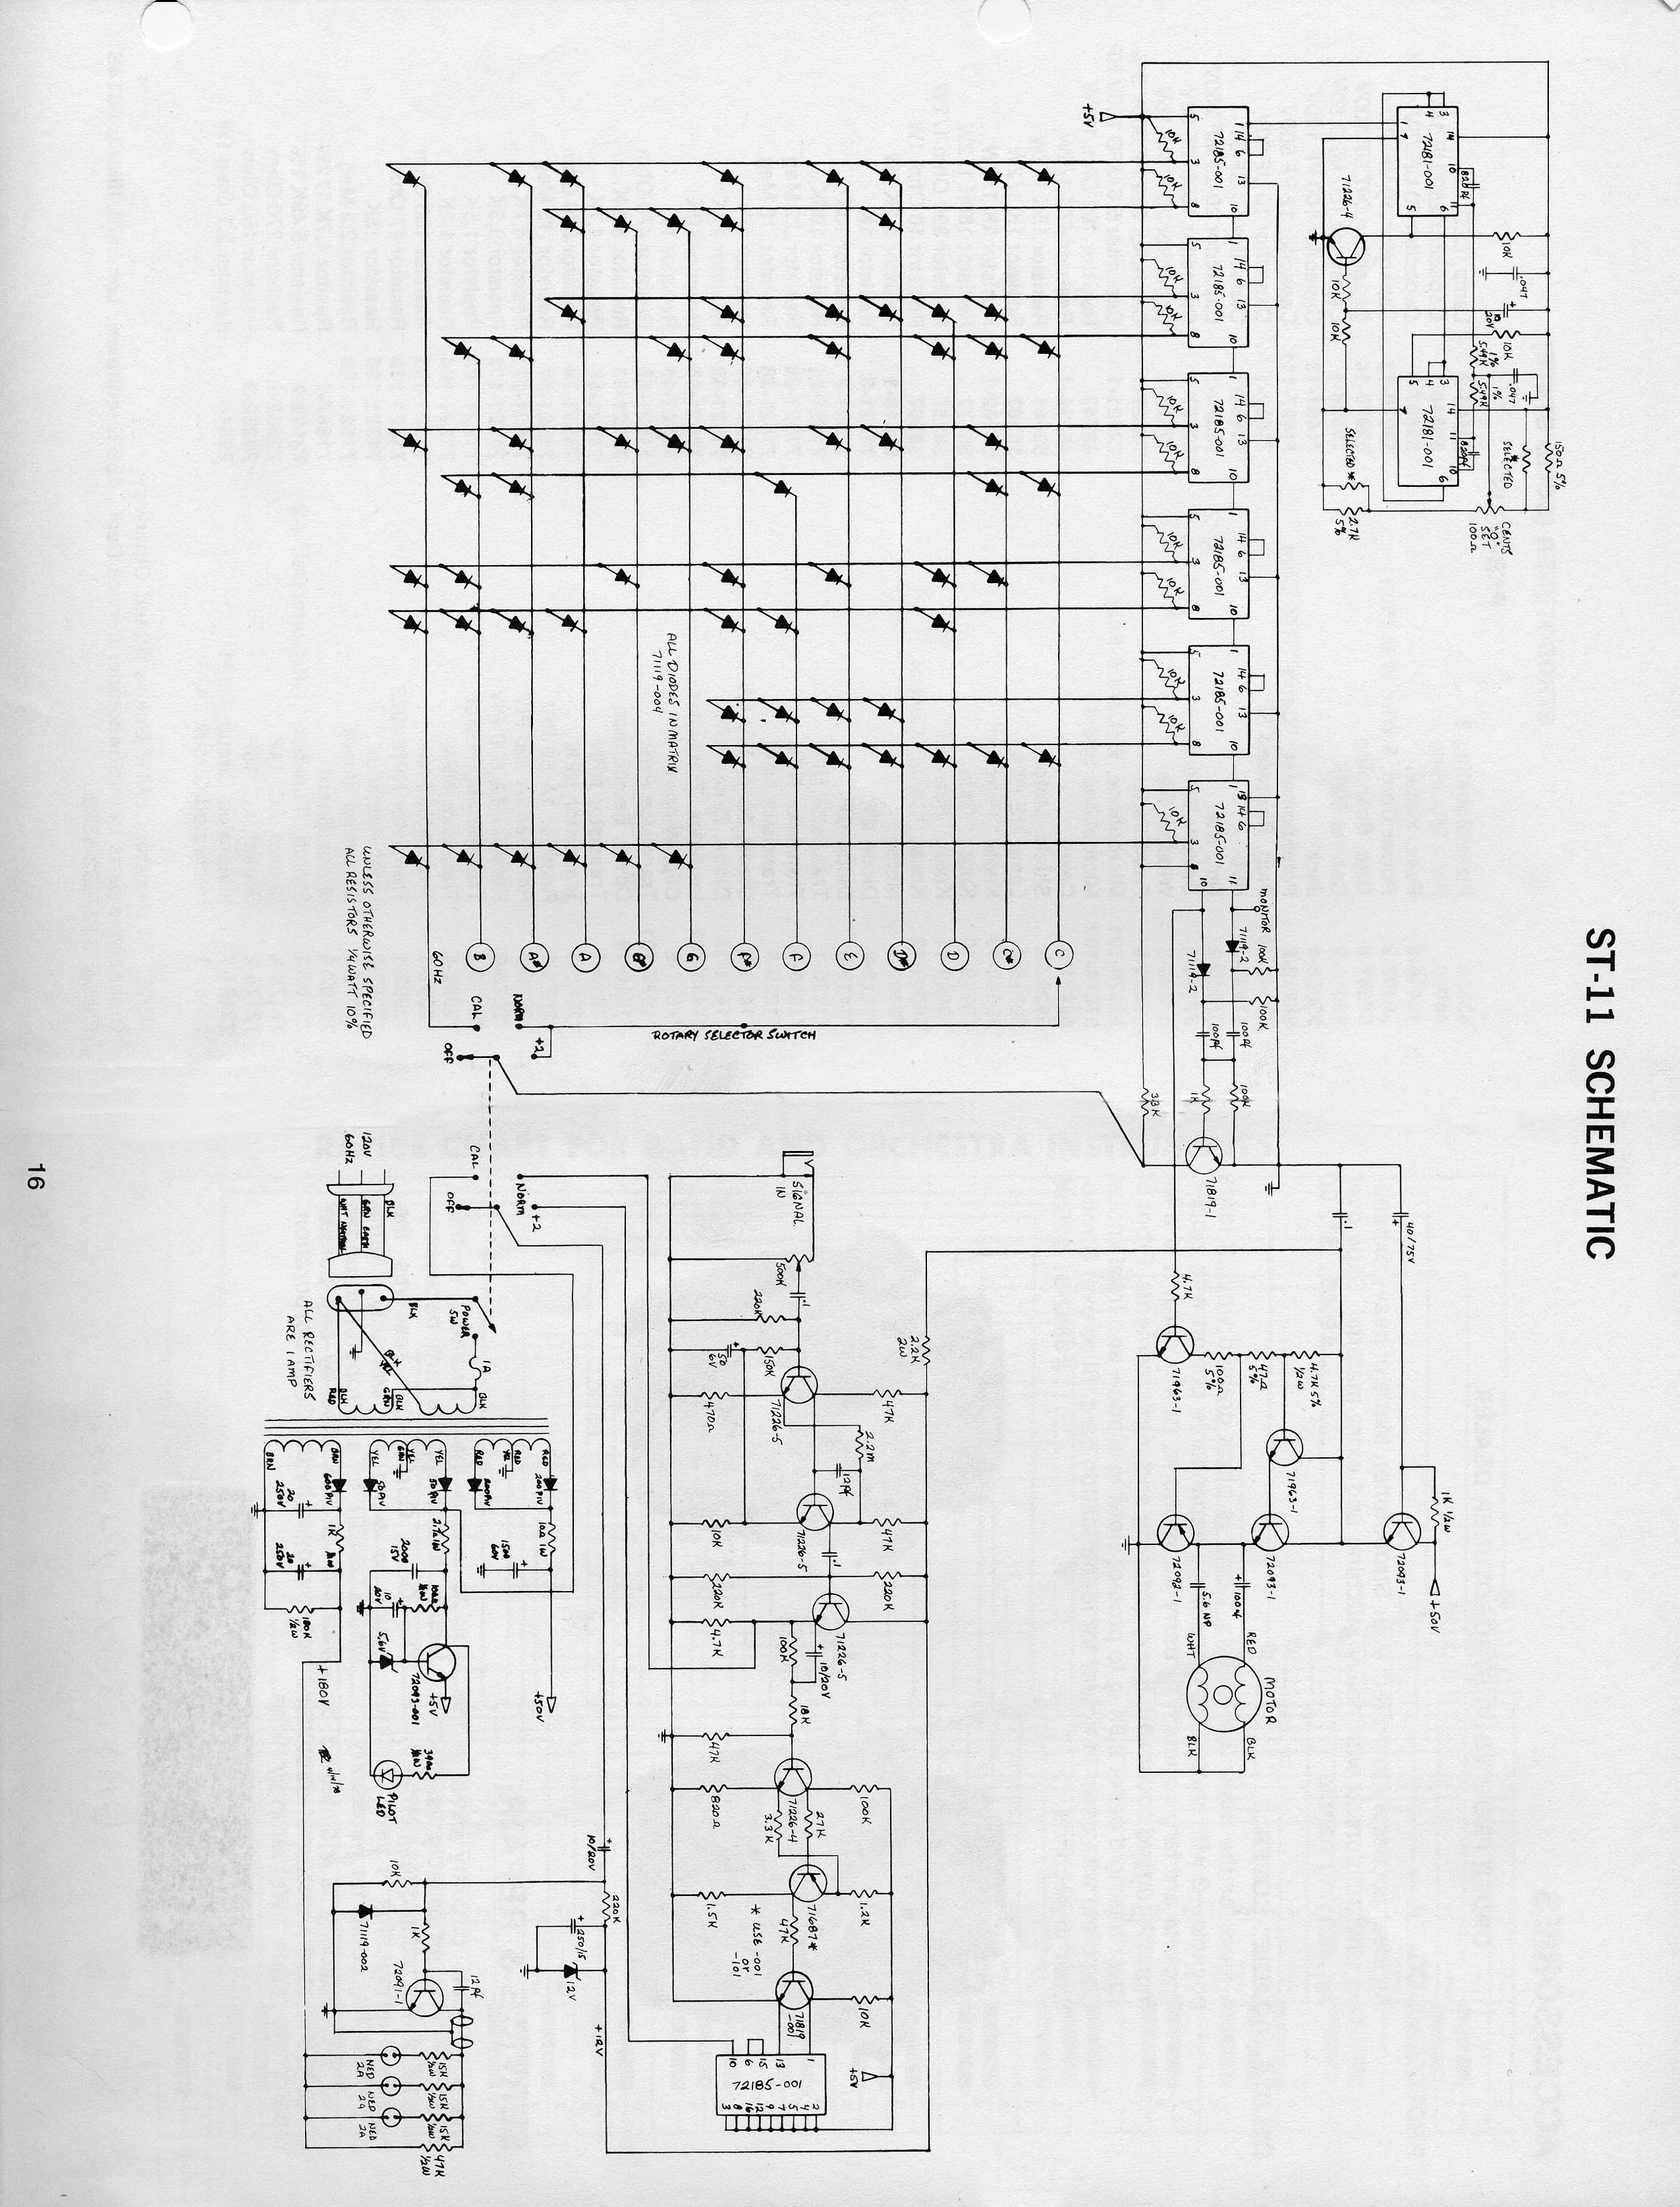 Fender Tweed Schematic | Wiring Diagram Database